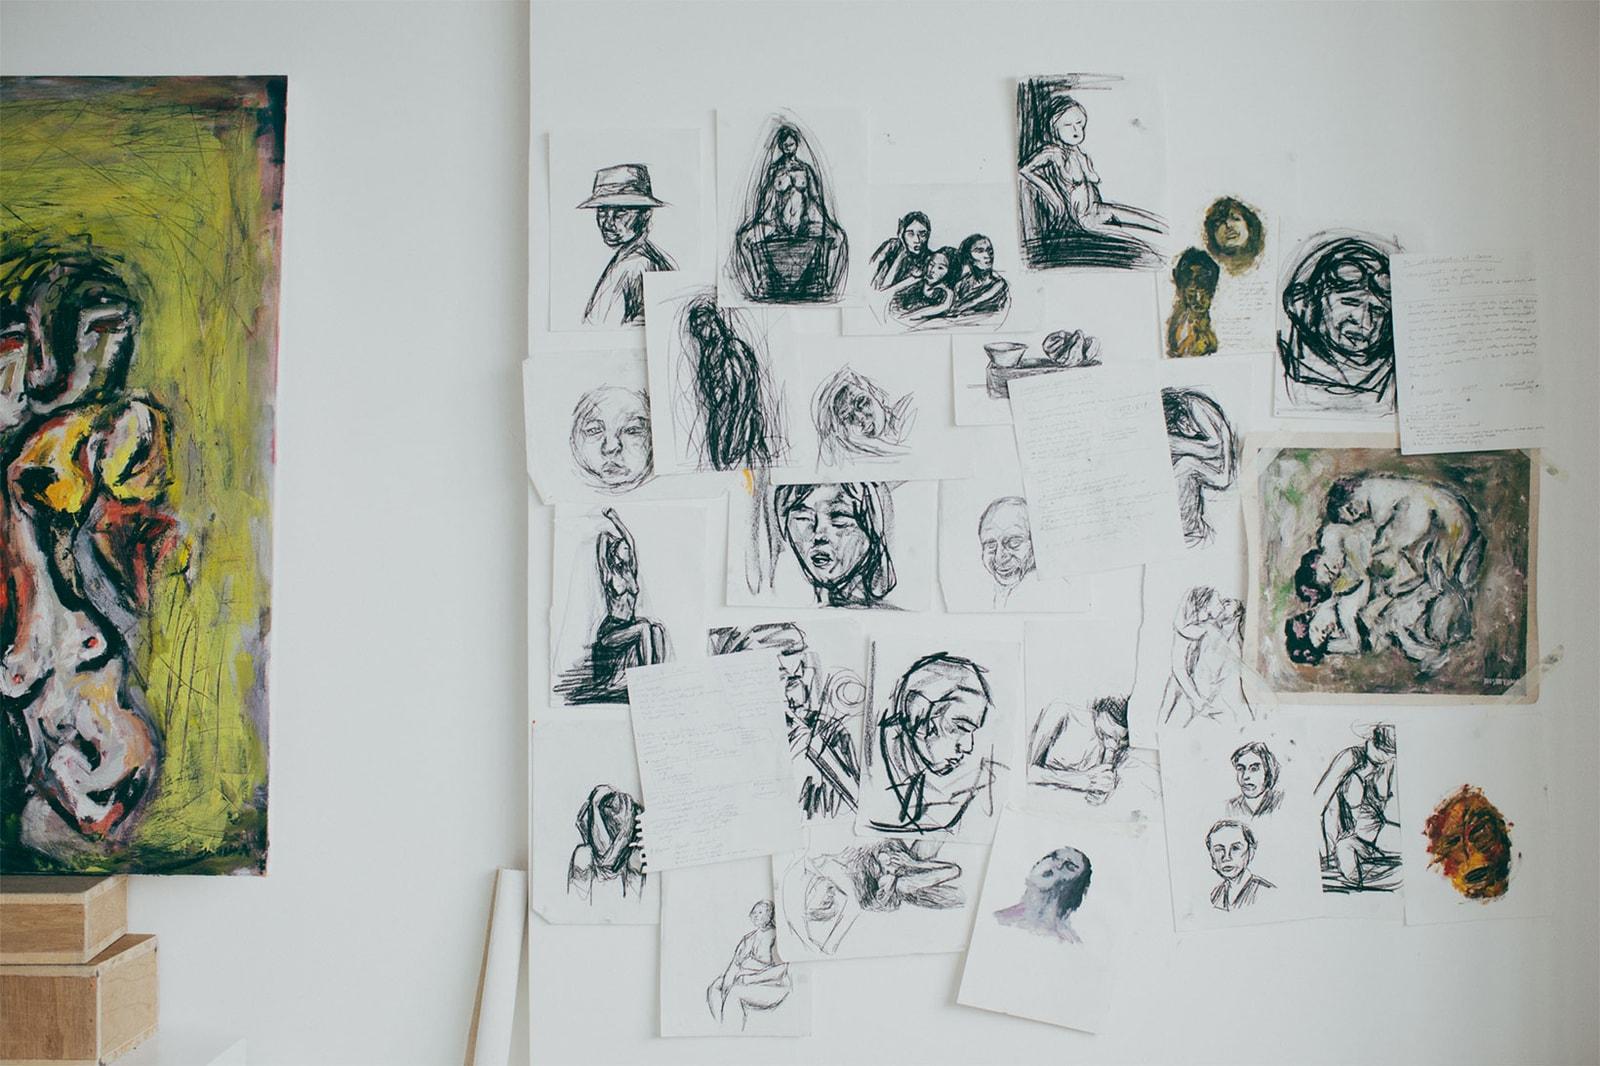 mizuki nishiyama artist hong kong japan italy interview oil paintings love and lust shunga mental health anxiety trauma